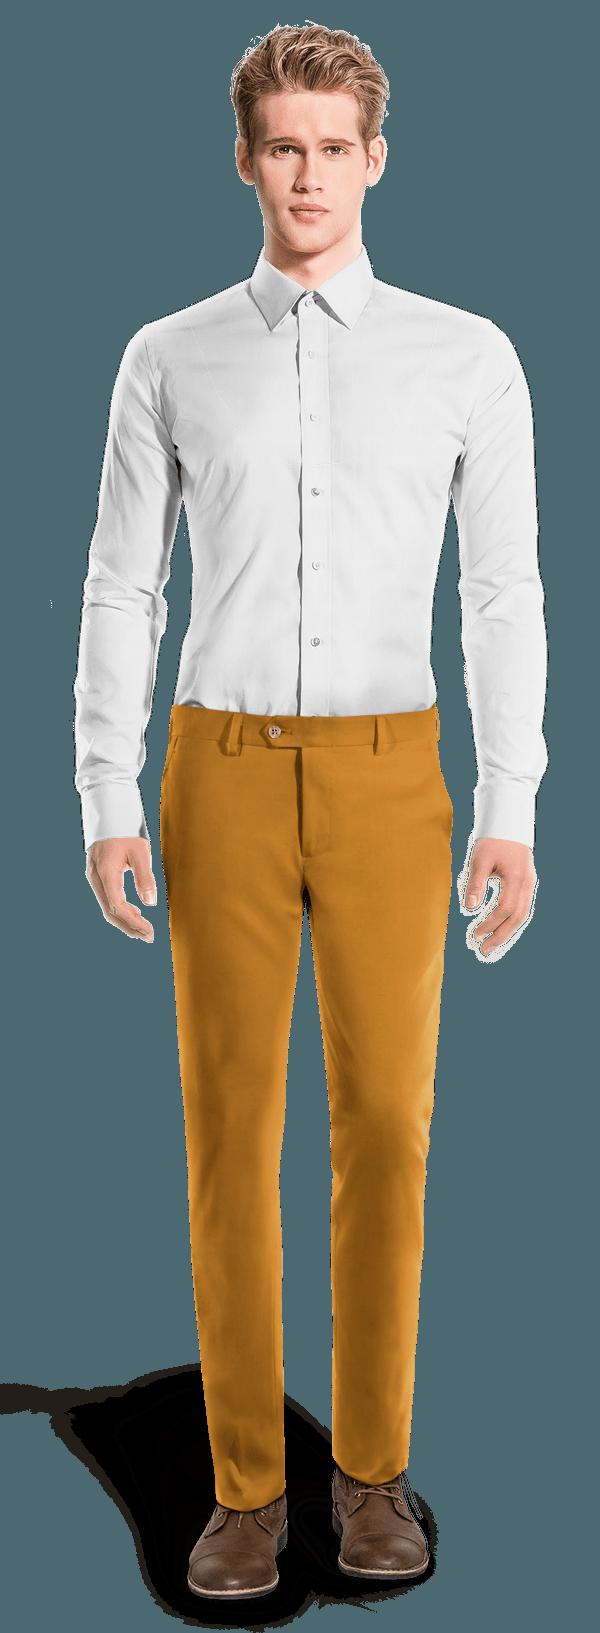 Yellow slim fit Chinos